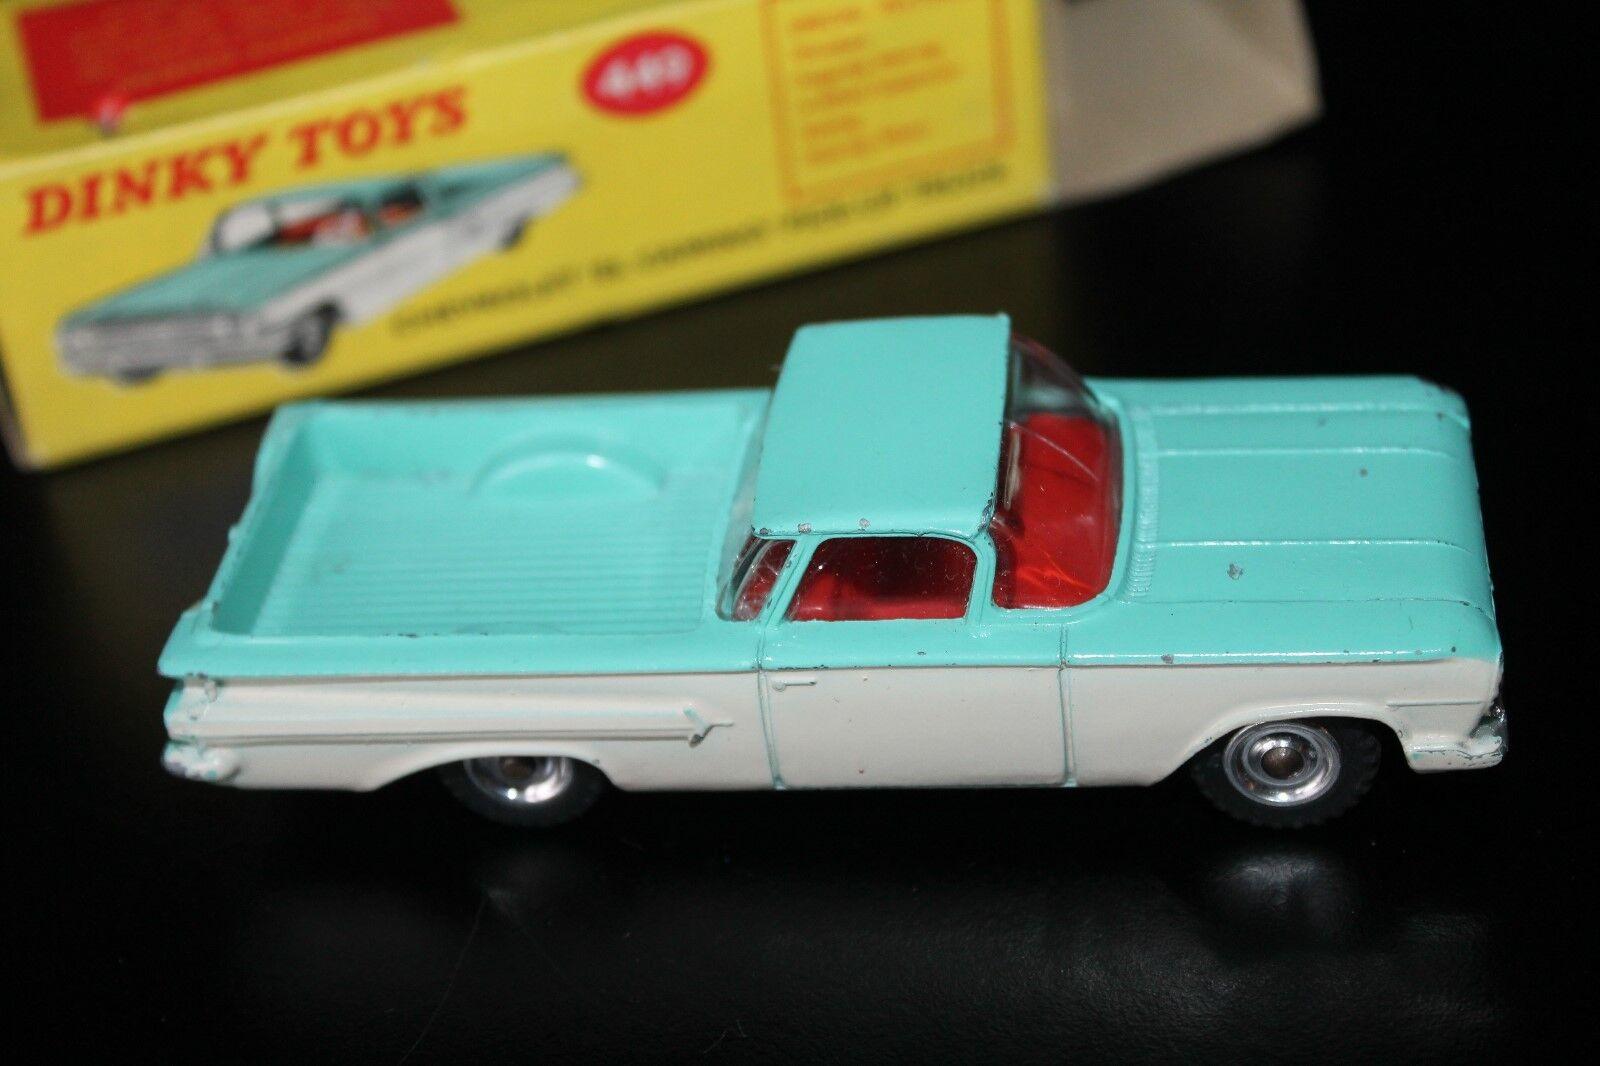 Dinky Toys 449  Chevrolet El Camino pick-up Truck  embalaje original  1 43